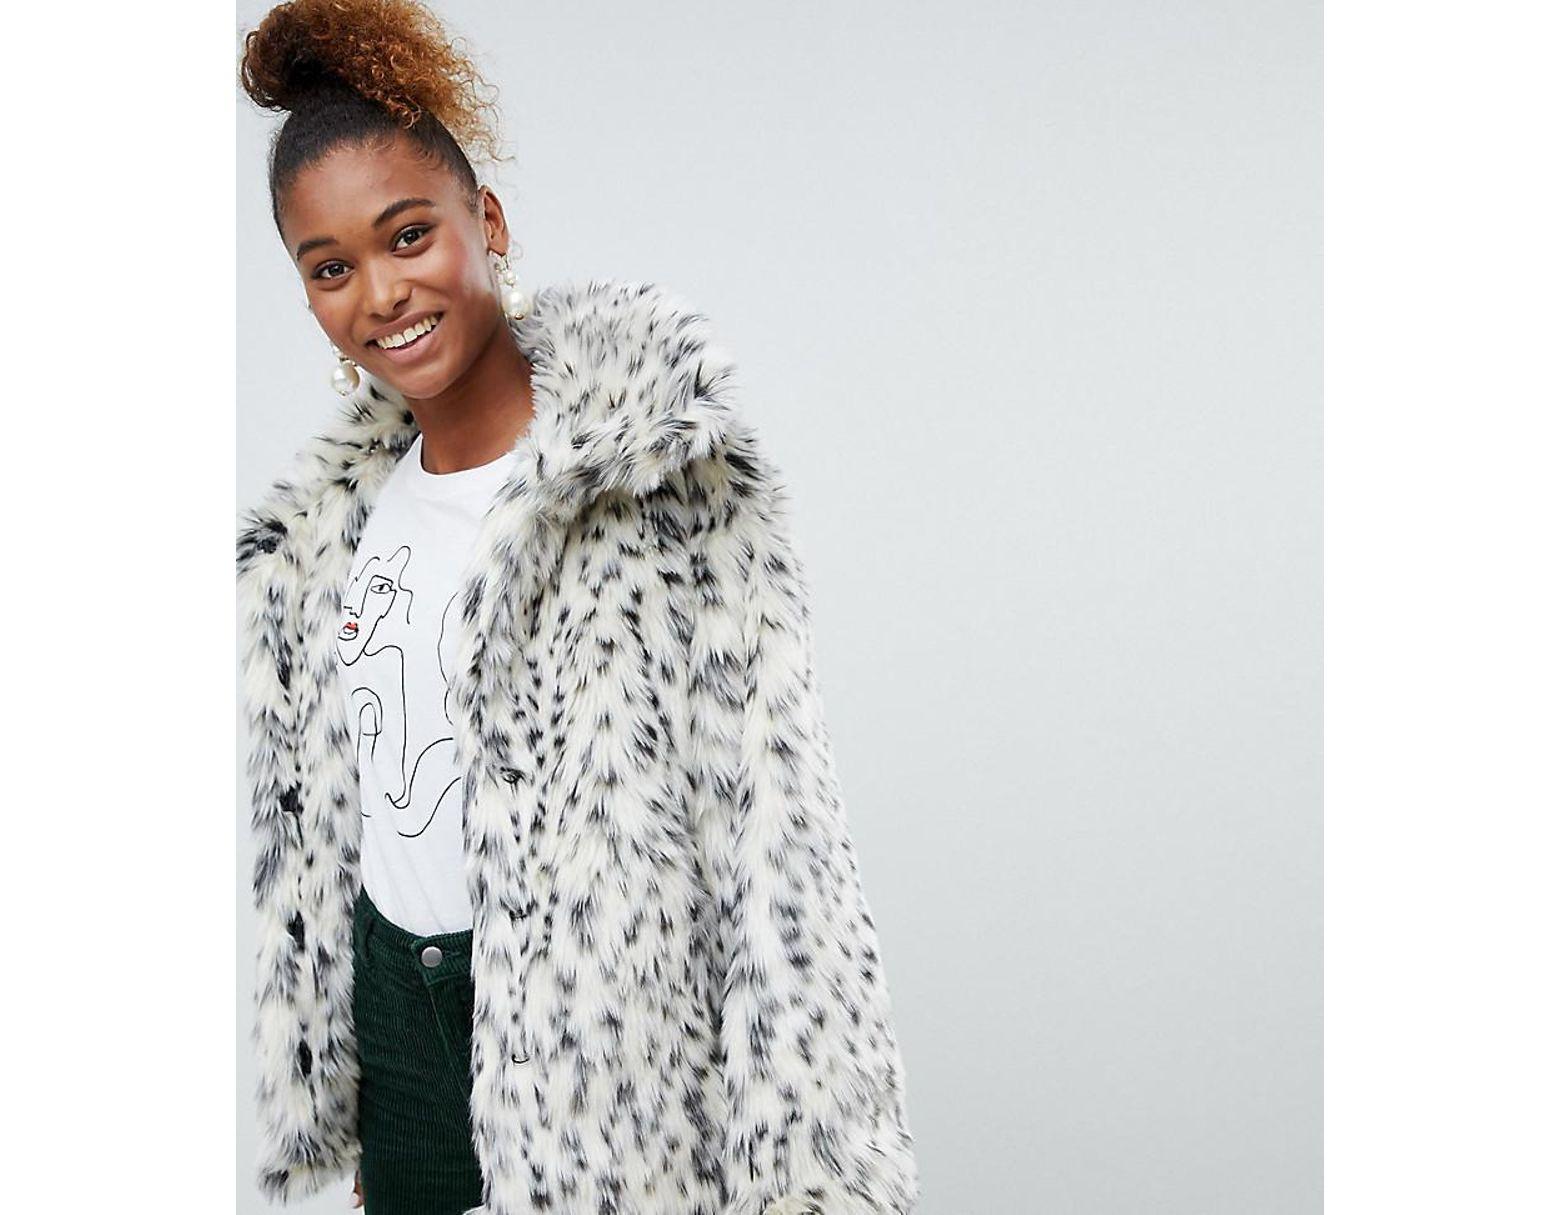 26ecc061efc0 Monki Faux Fur Leopard Print Jacket In Black And White in White - Lyst